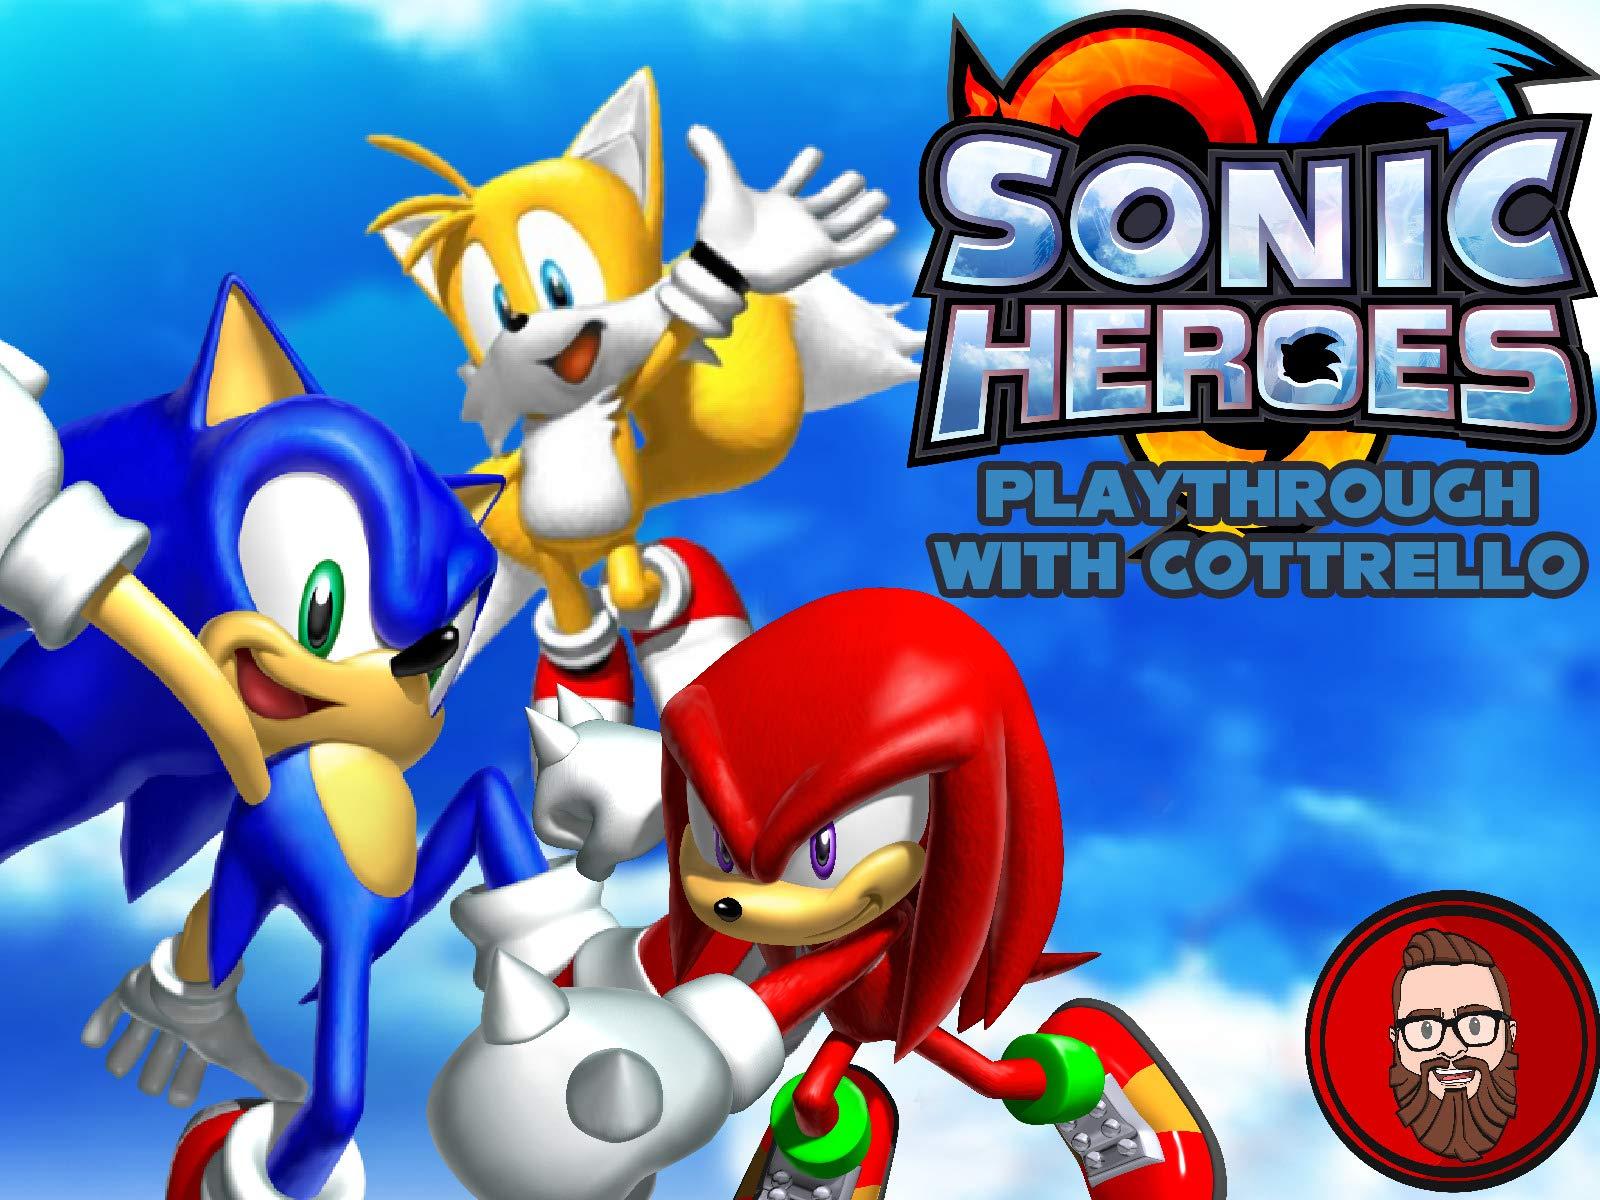 Watch Sonic Heroes Playthrough With Cottrello On Amazon Prime Video Uk Newonamzprimeuk